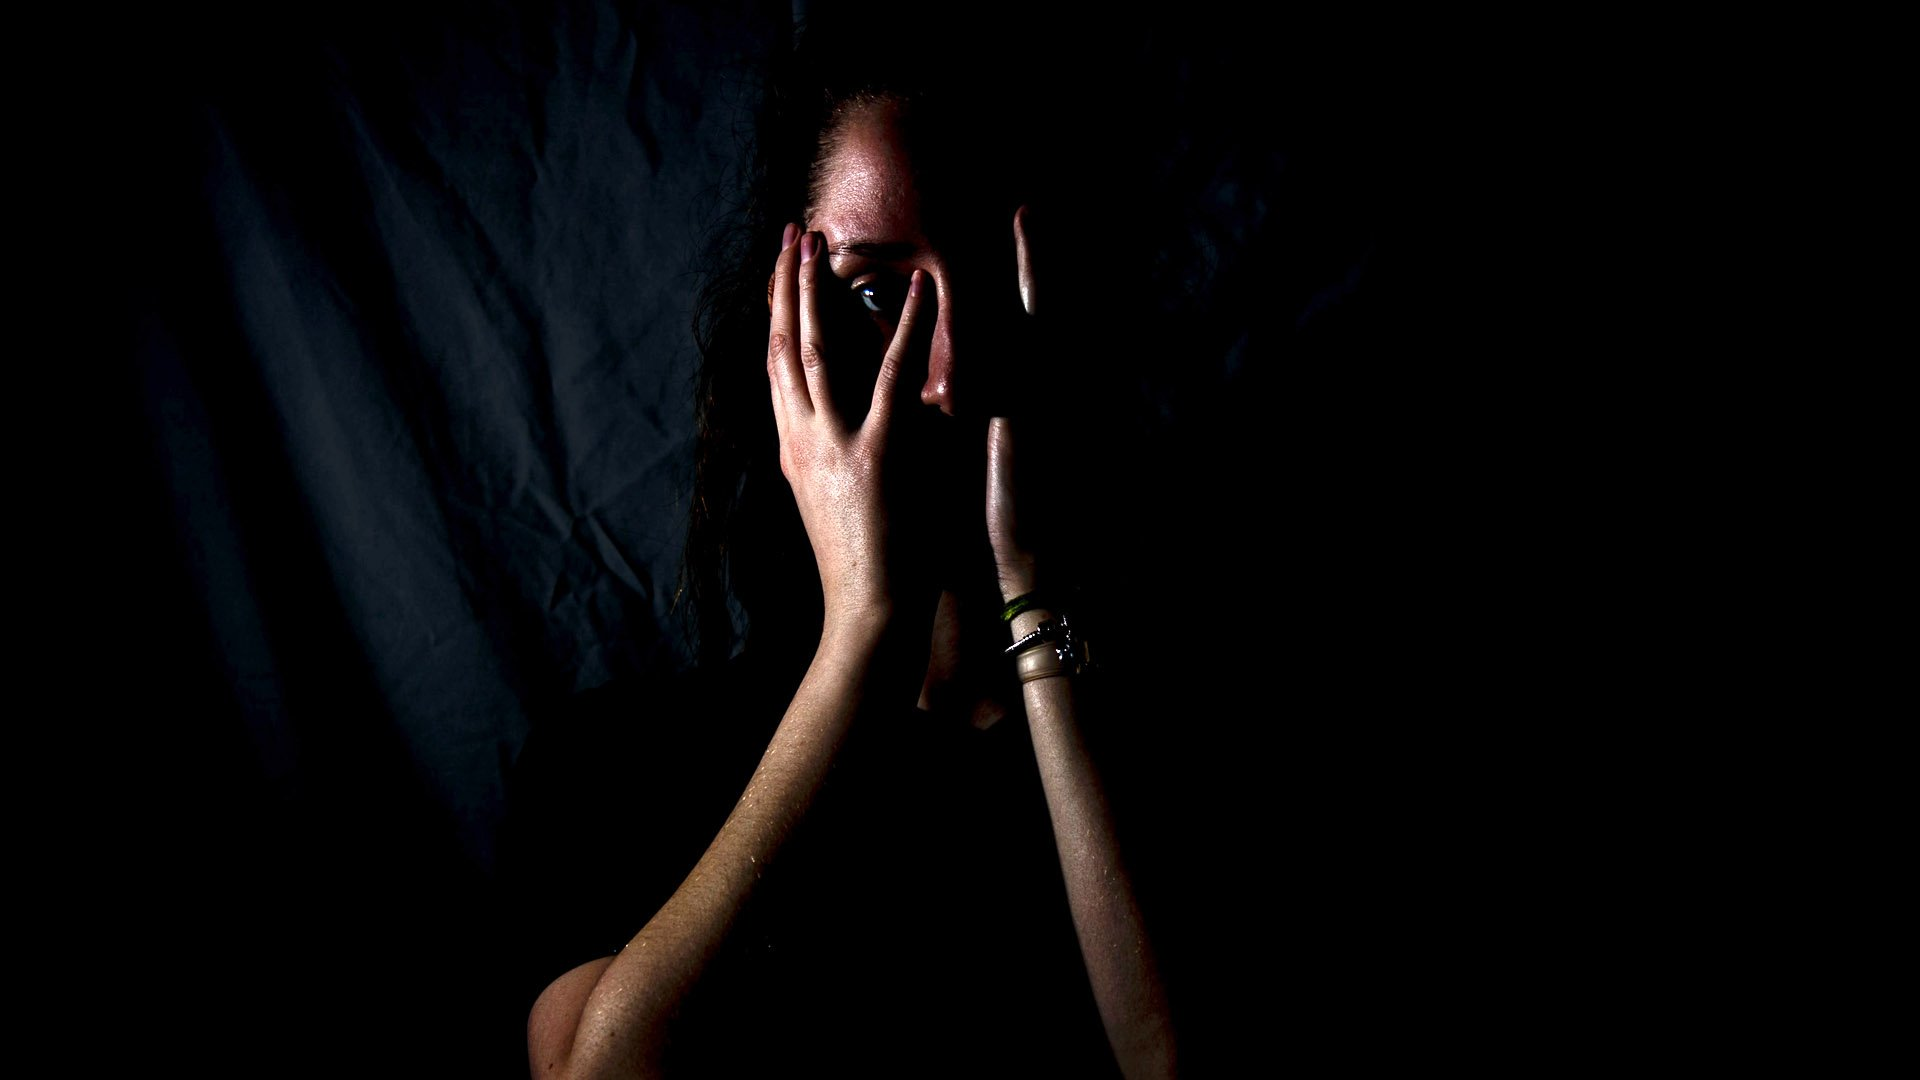 violenza sulle donne quarantena coronavirus